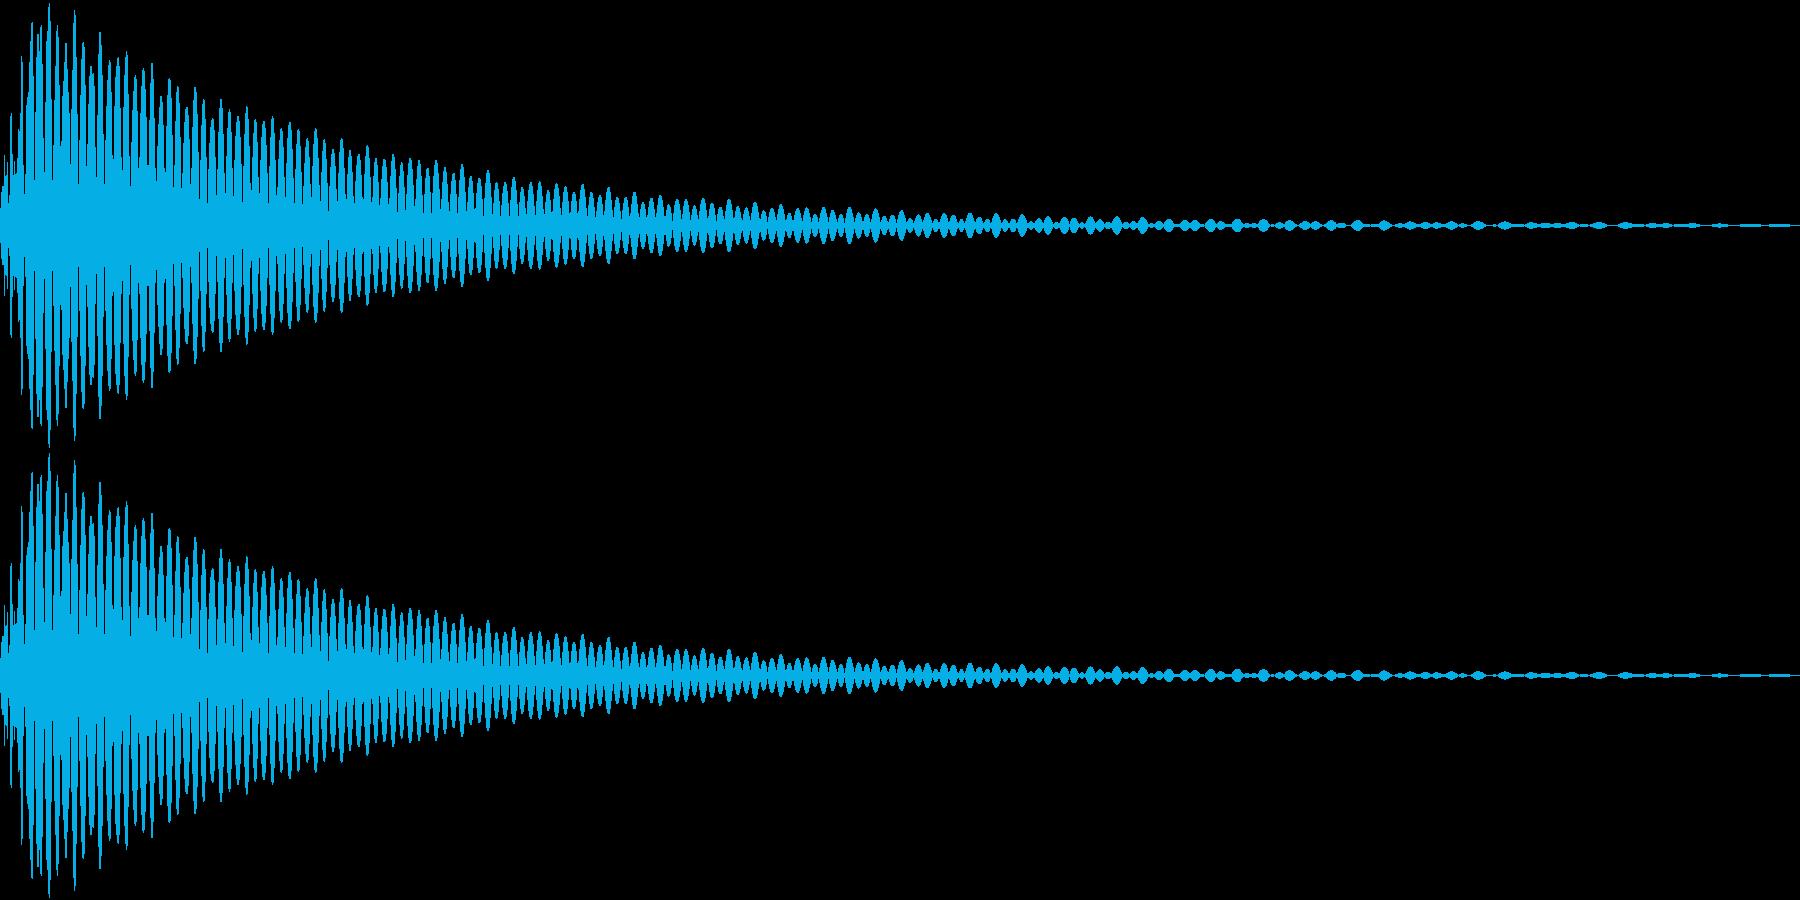 DTM Tom 10 オリジナル音源の再生済みの波形